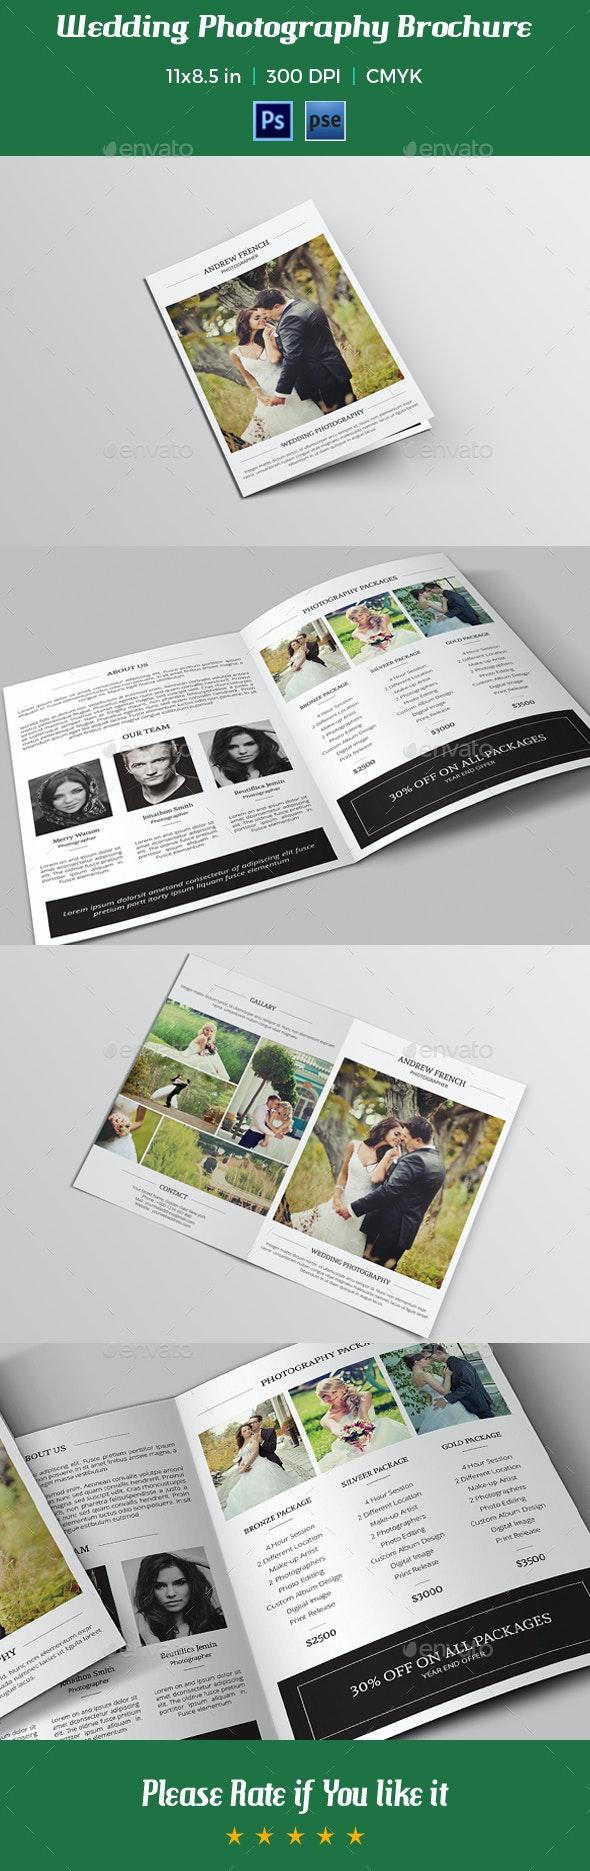 Wedding Photography Brochure Template-V010 - Corporate Brochures